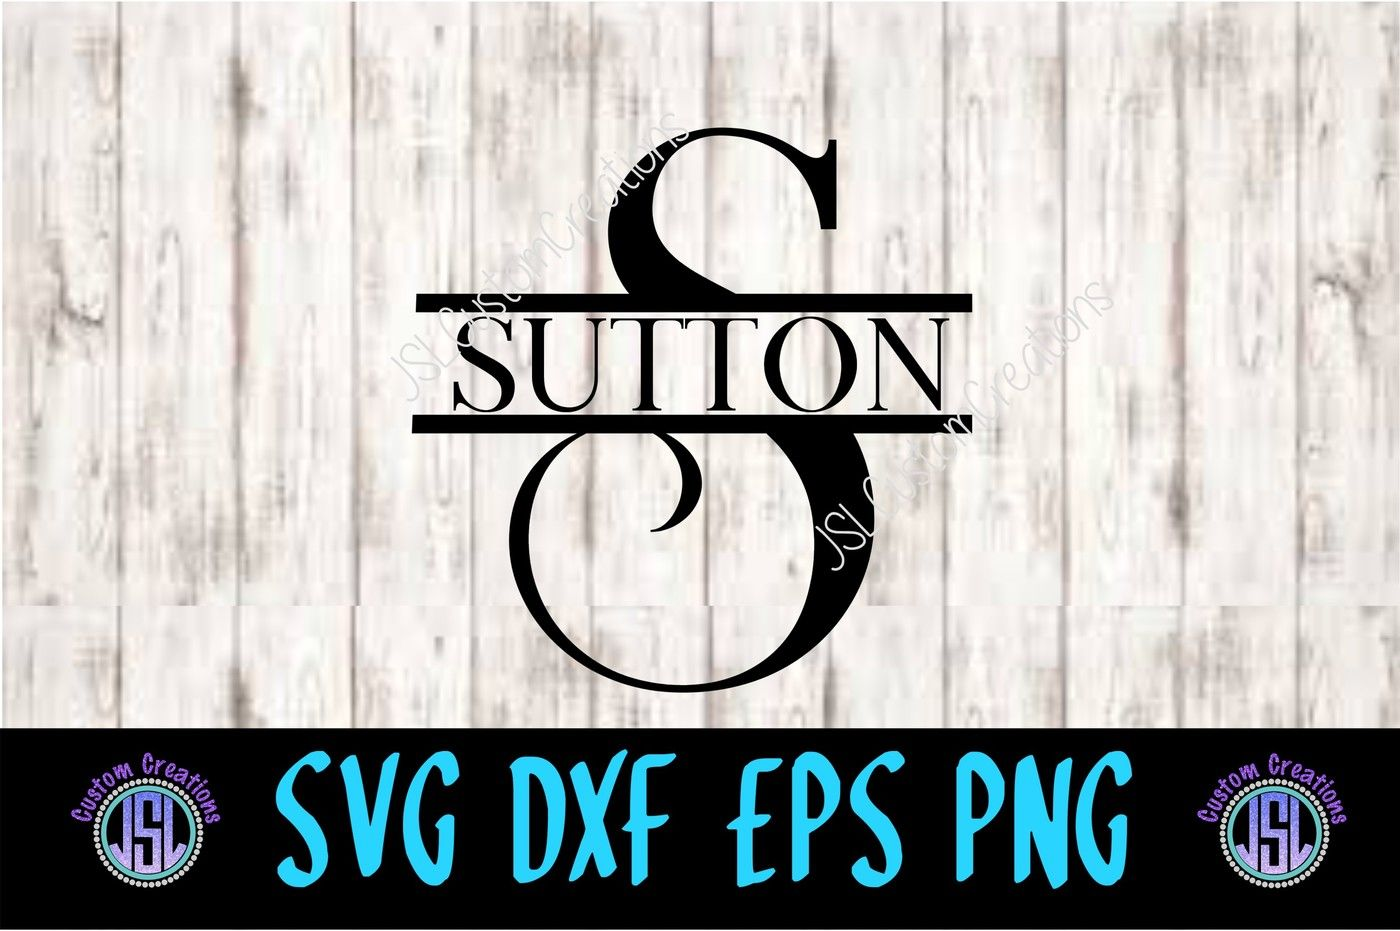 Split Letter Monogram Svg Dxf Eps Png By Jslcustomcreations Thehungryjpeg Com